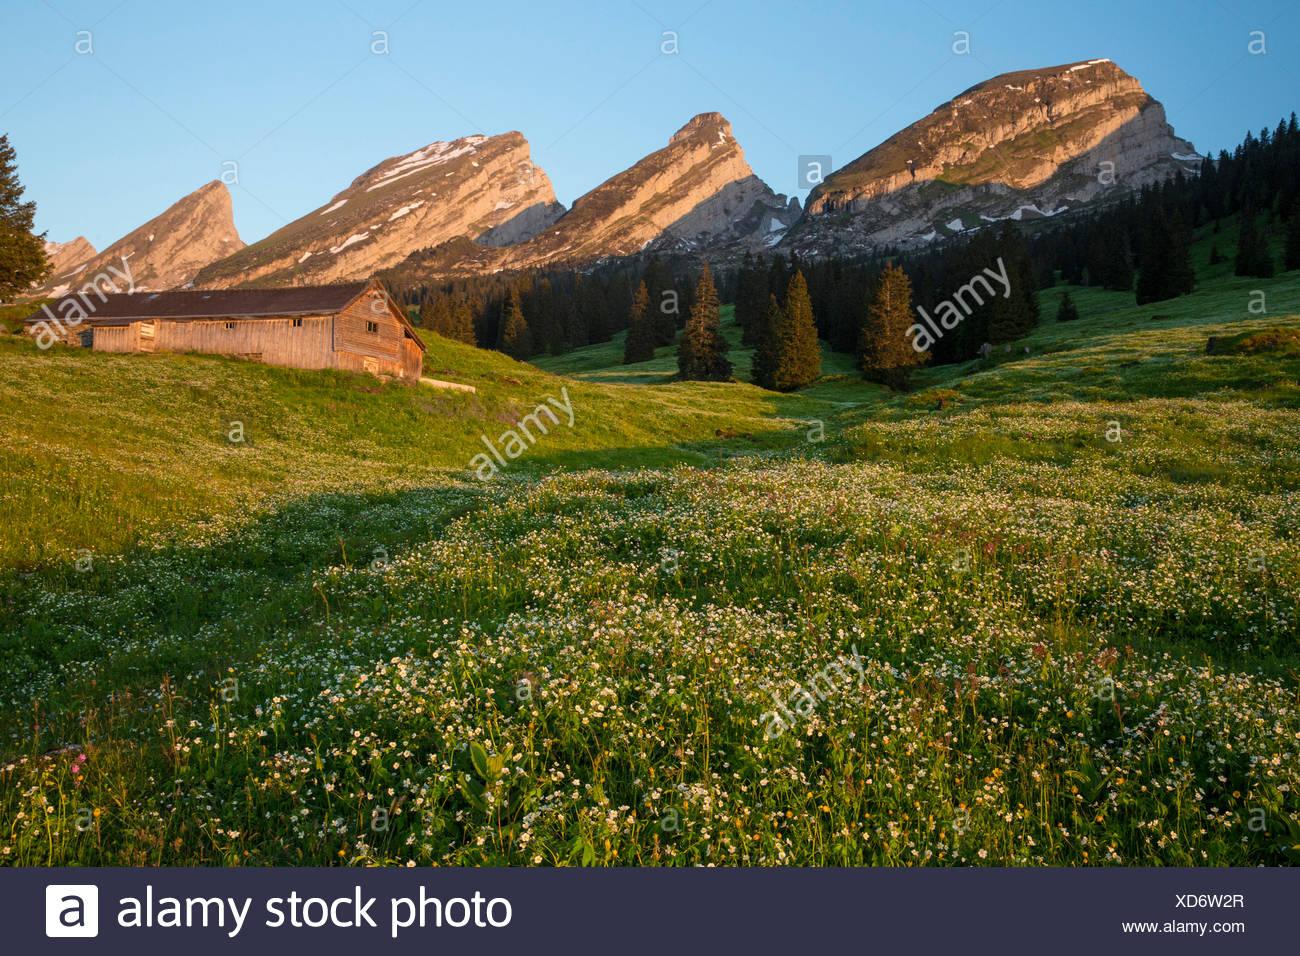 Churfirsten, Alp Sellamatt, Churfirsten, mountain, mountains, flower, flowers, SG, canton St. Gallen, Toggenburg, meadow, hut SA - Stock Image